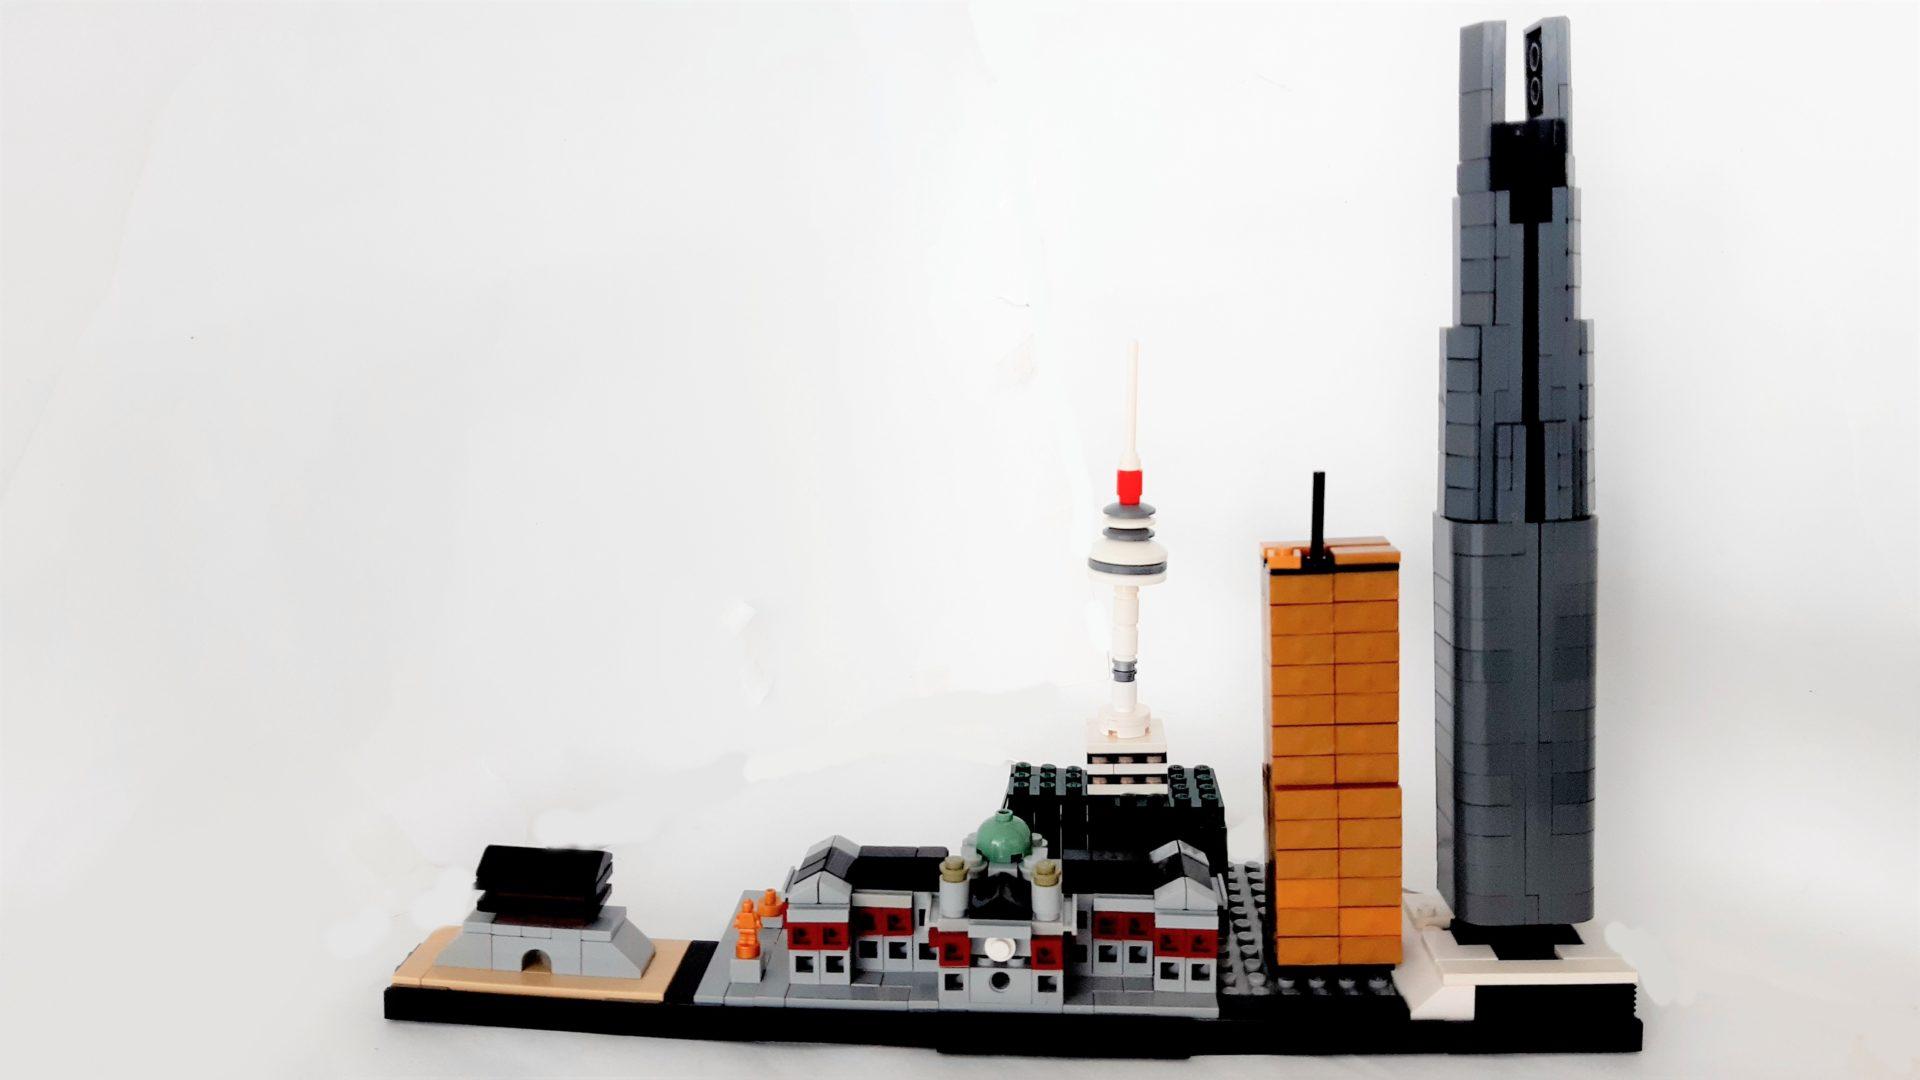 Seoul Skyline by Paterson